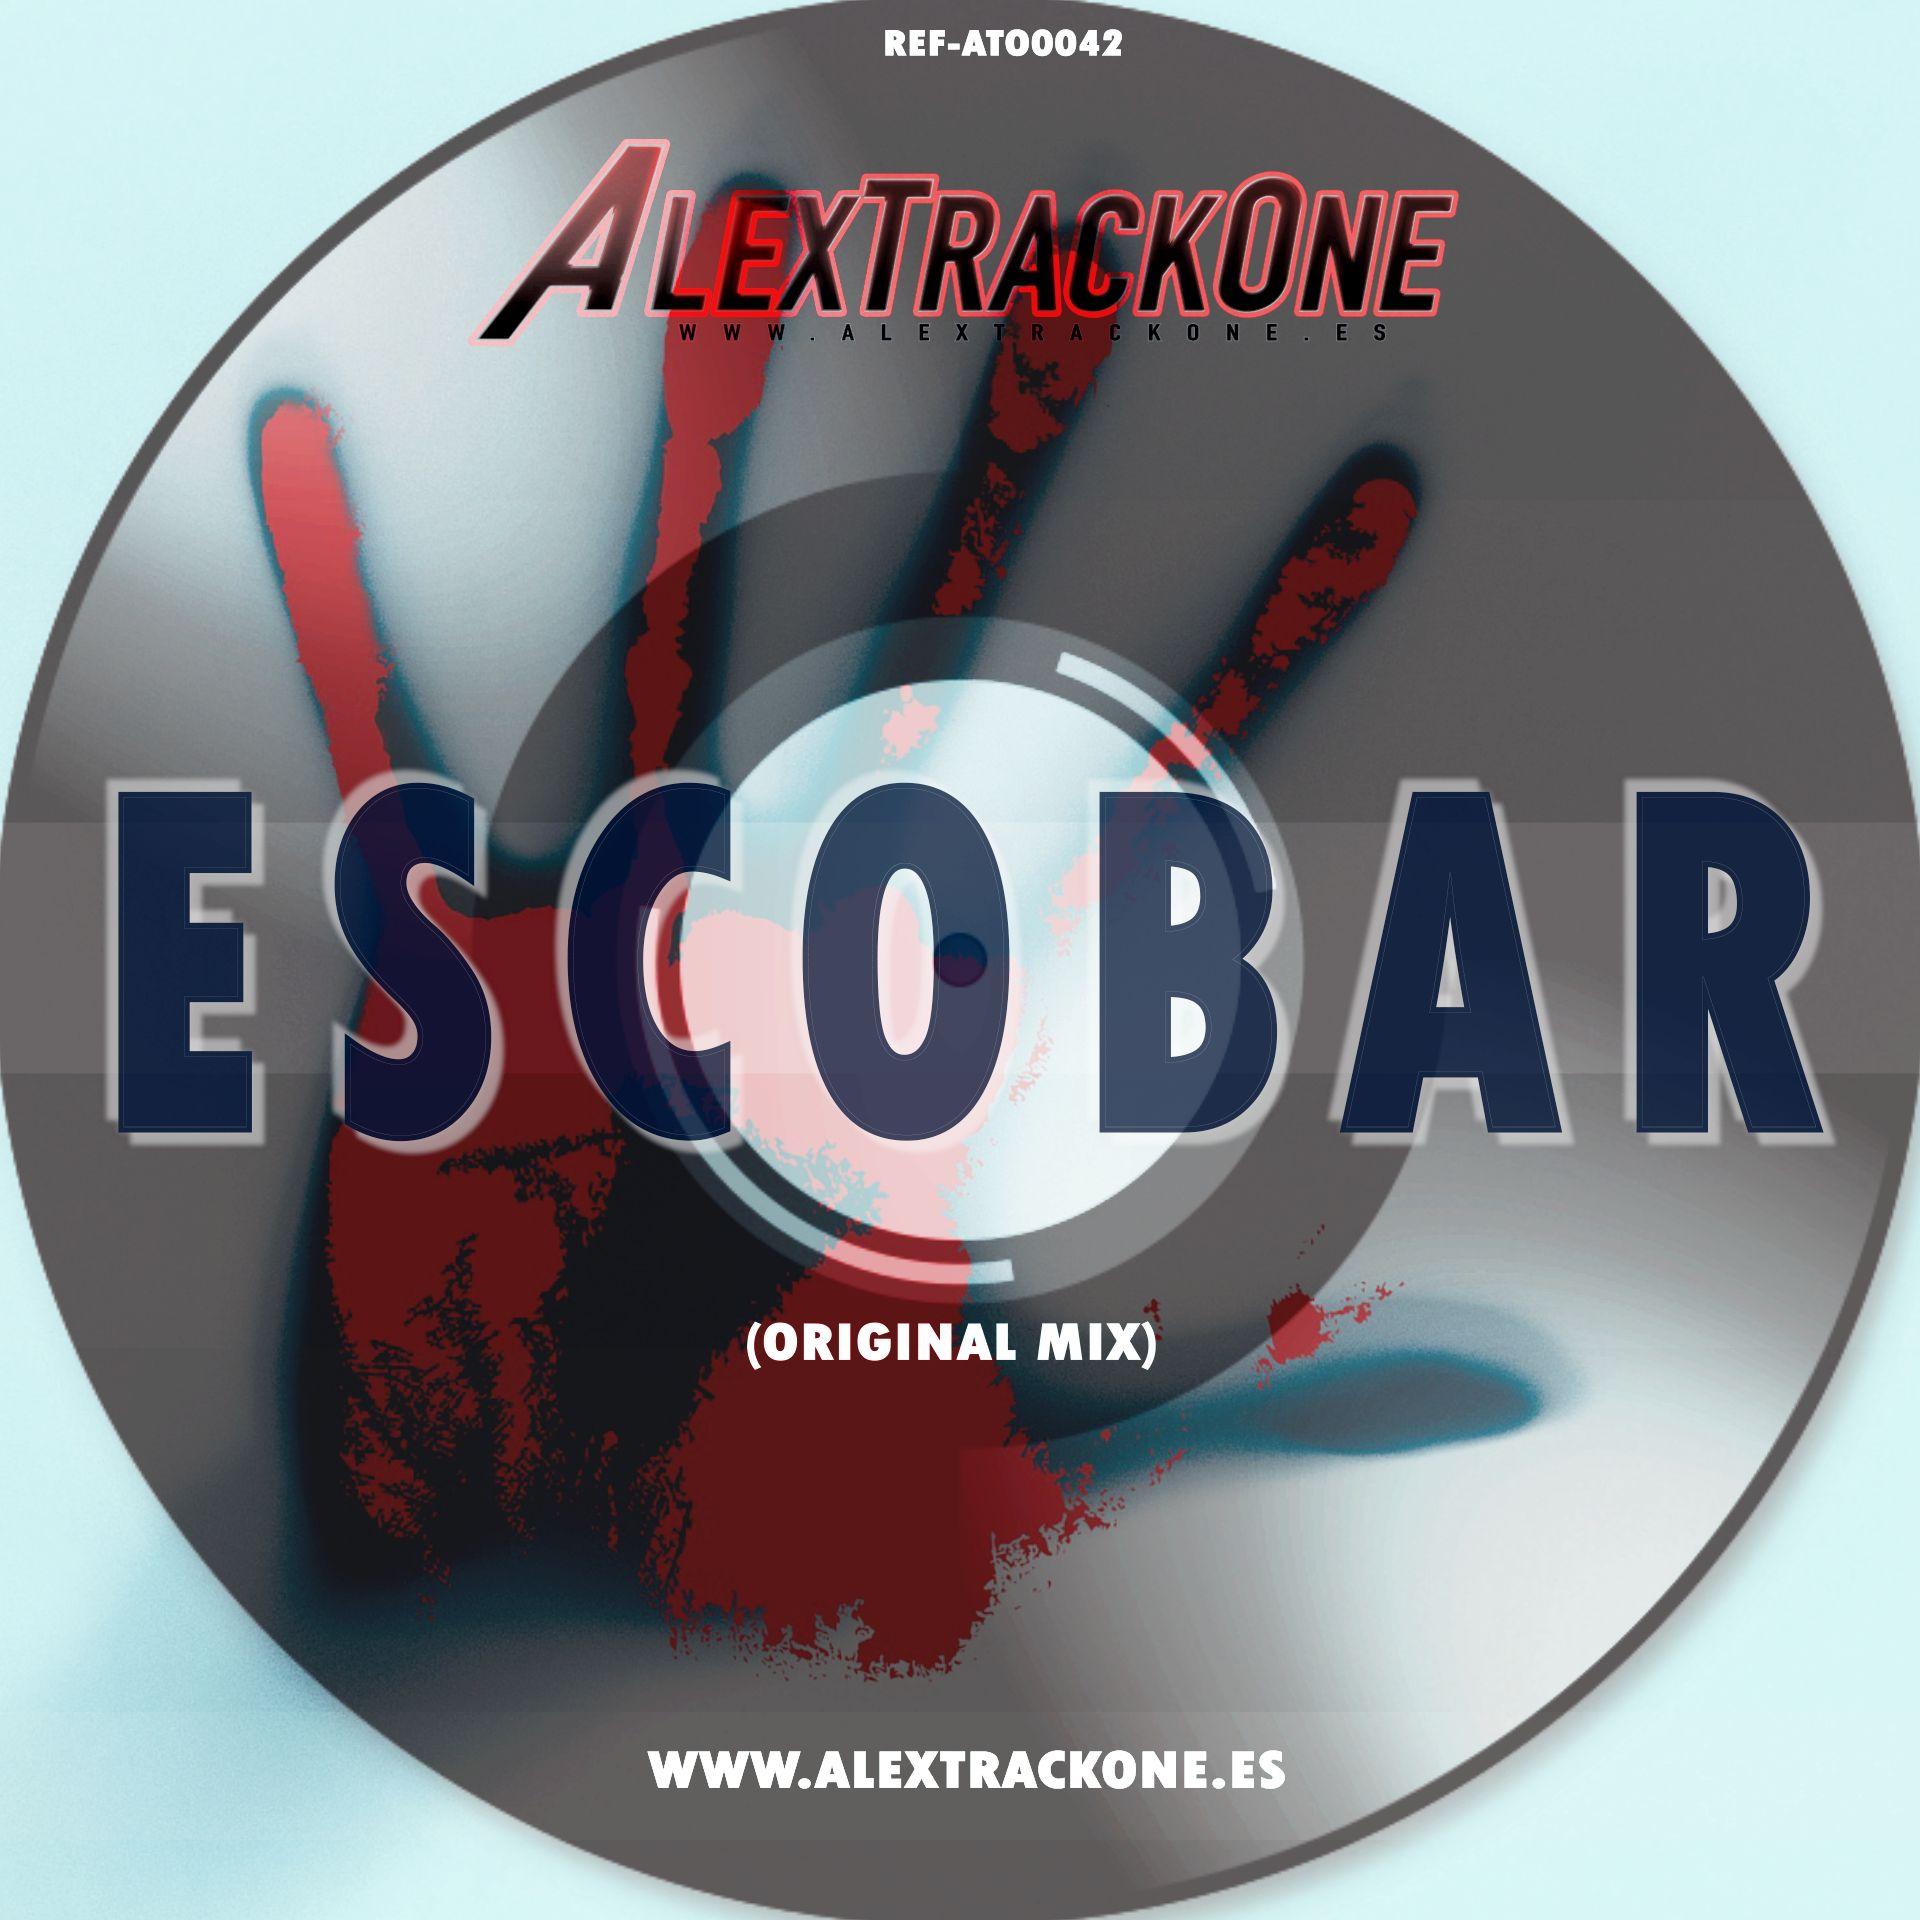 REF-ATO0042 ESCOBAR (ORIGINAL MIX) (MP3 & WAV)